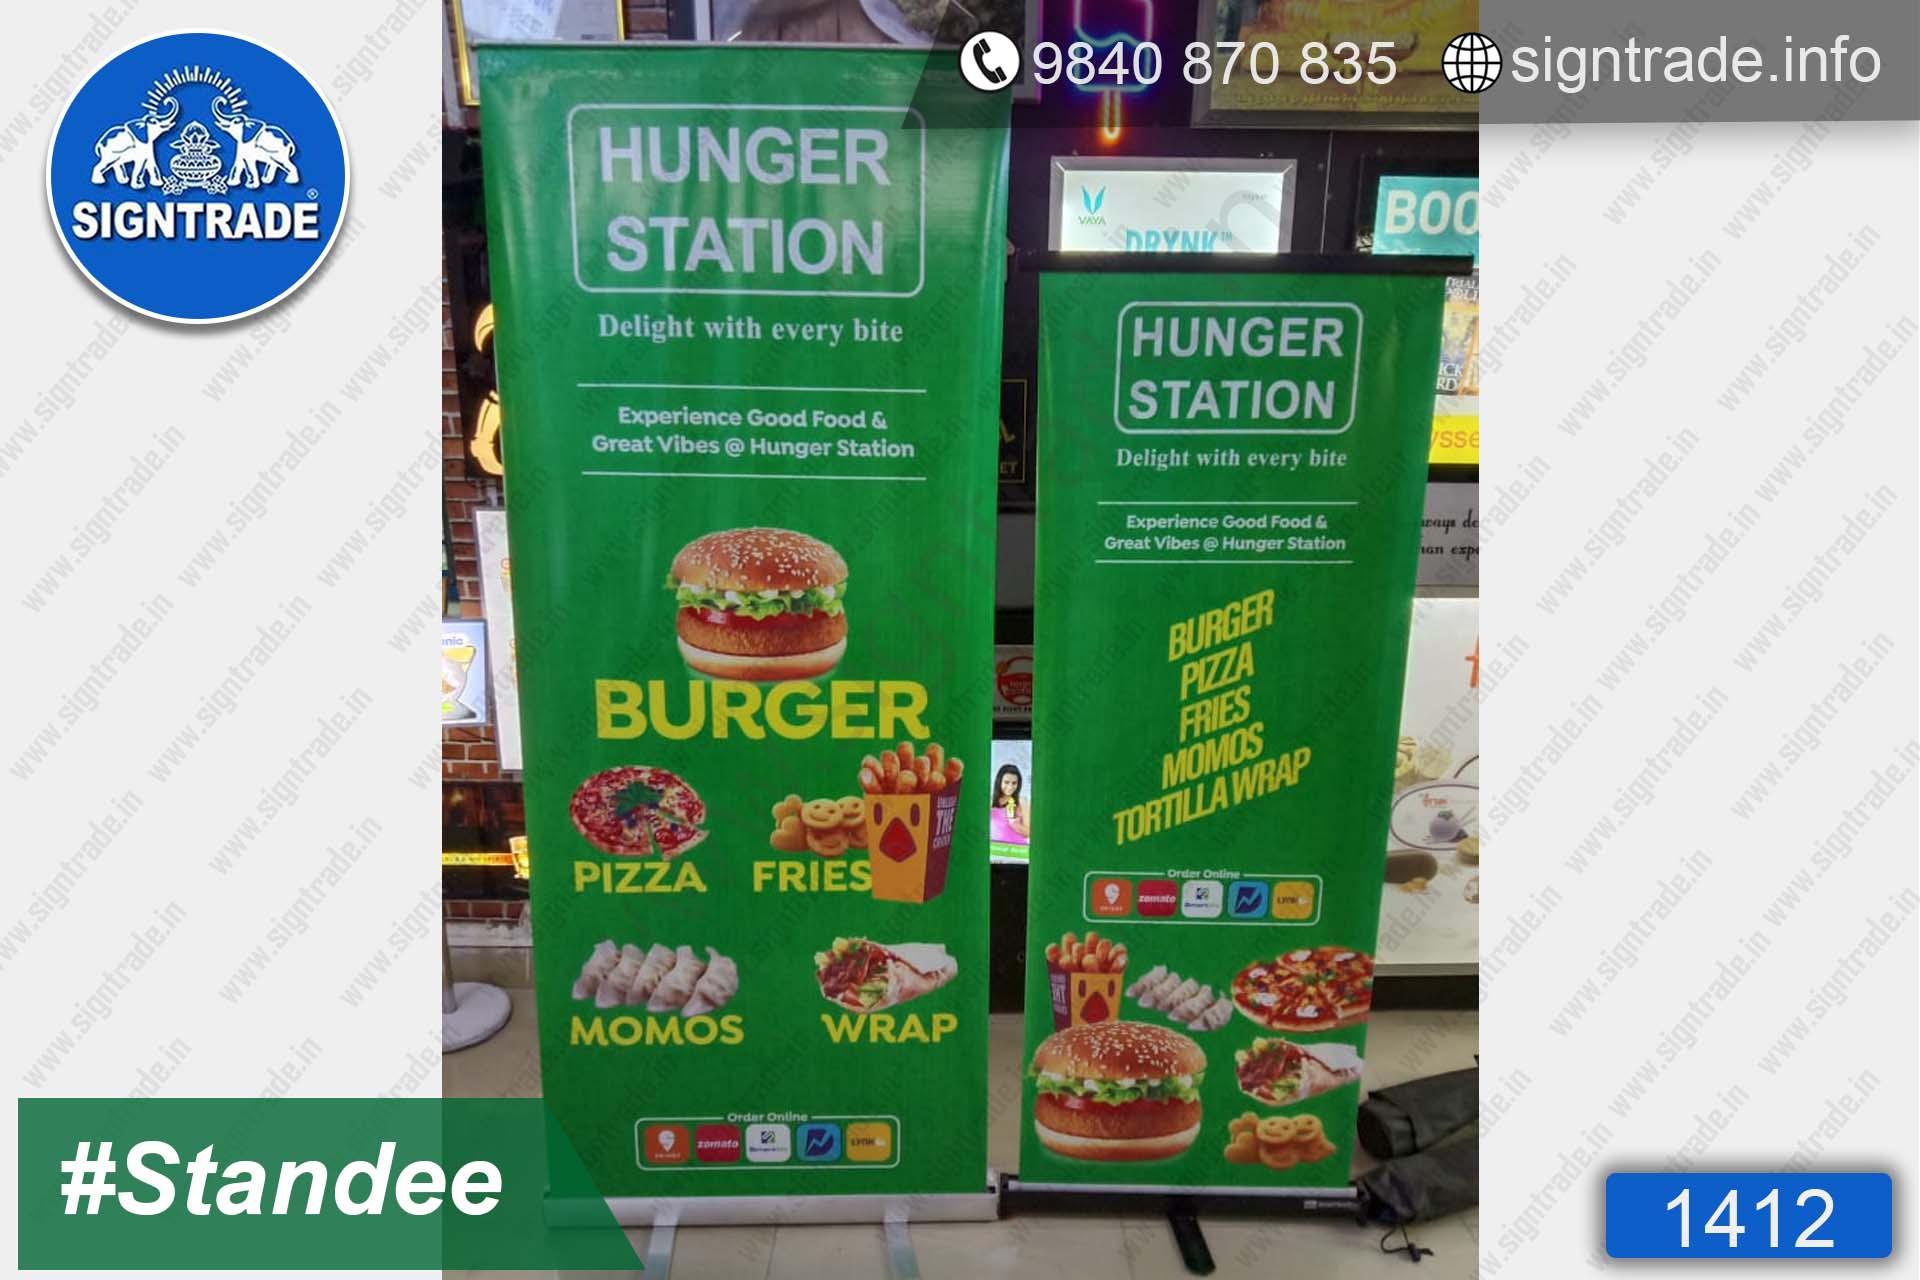 Hunger Station Restaurant - 1412, Retractable Banner, Roll Up Banner Stand, Banner Stand, Roll Up Banner, Standee, Promotional Standee, Promotional Roll Up Standee, Promo Standee